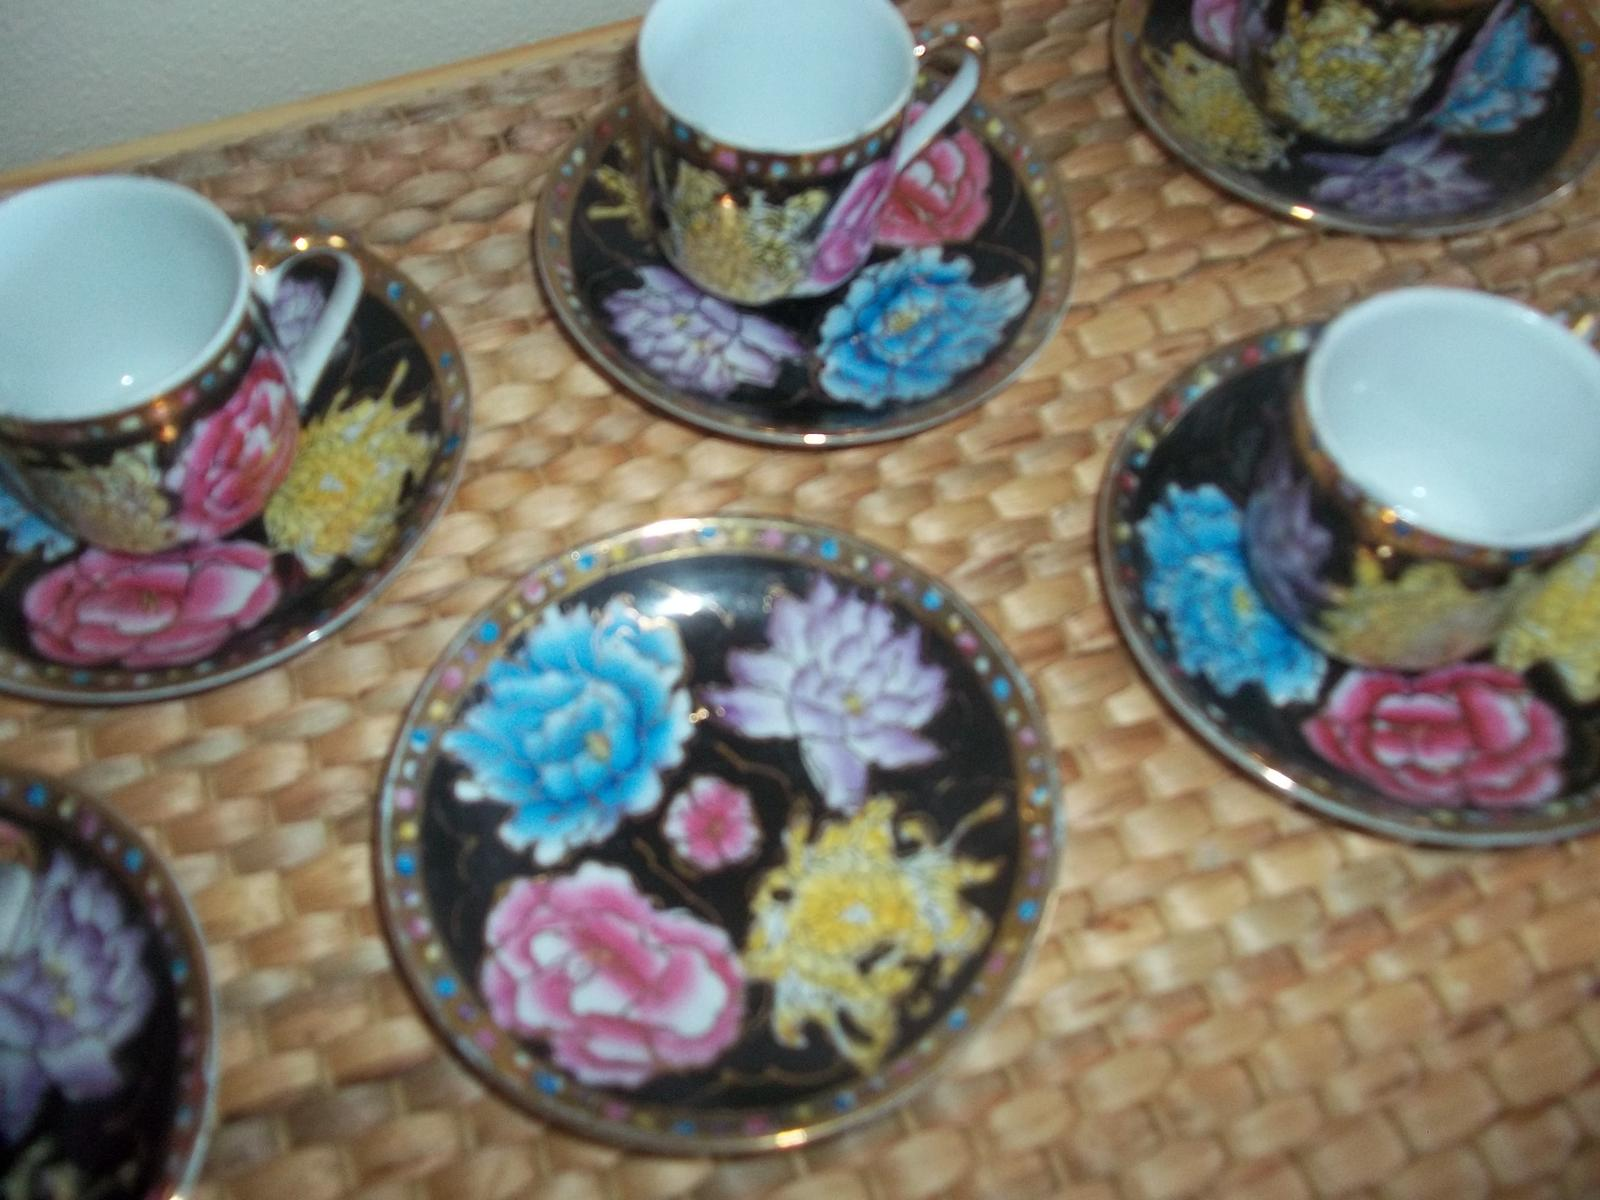 Staručké šálky z čínskeho porcelánu - Obrázok č. 3